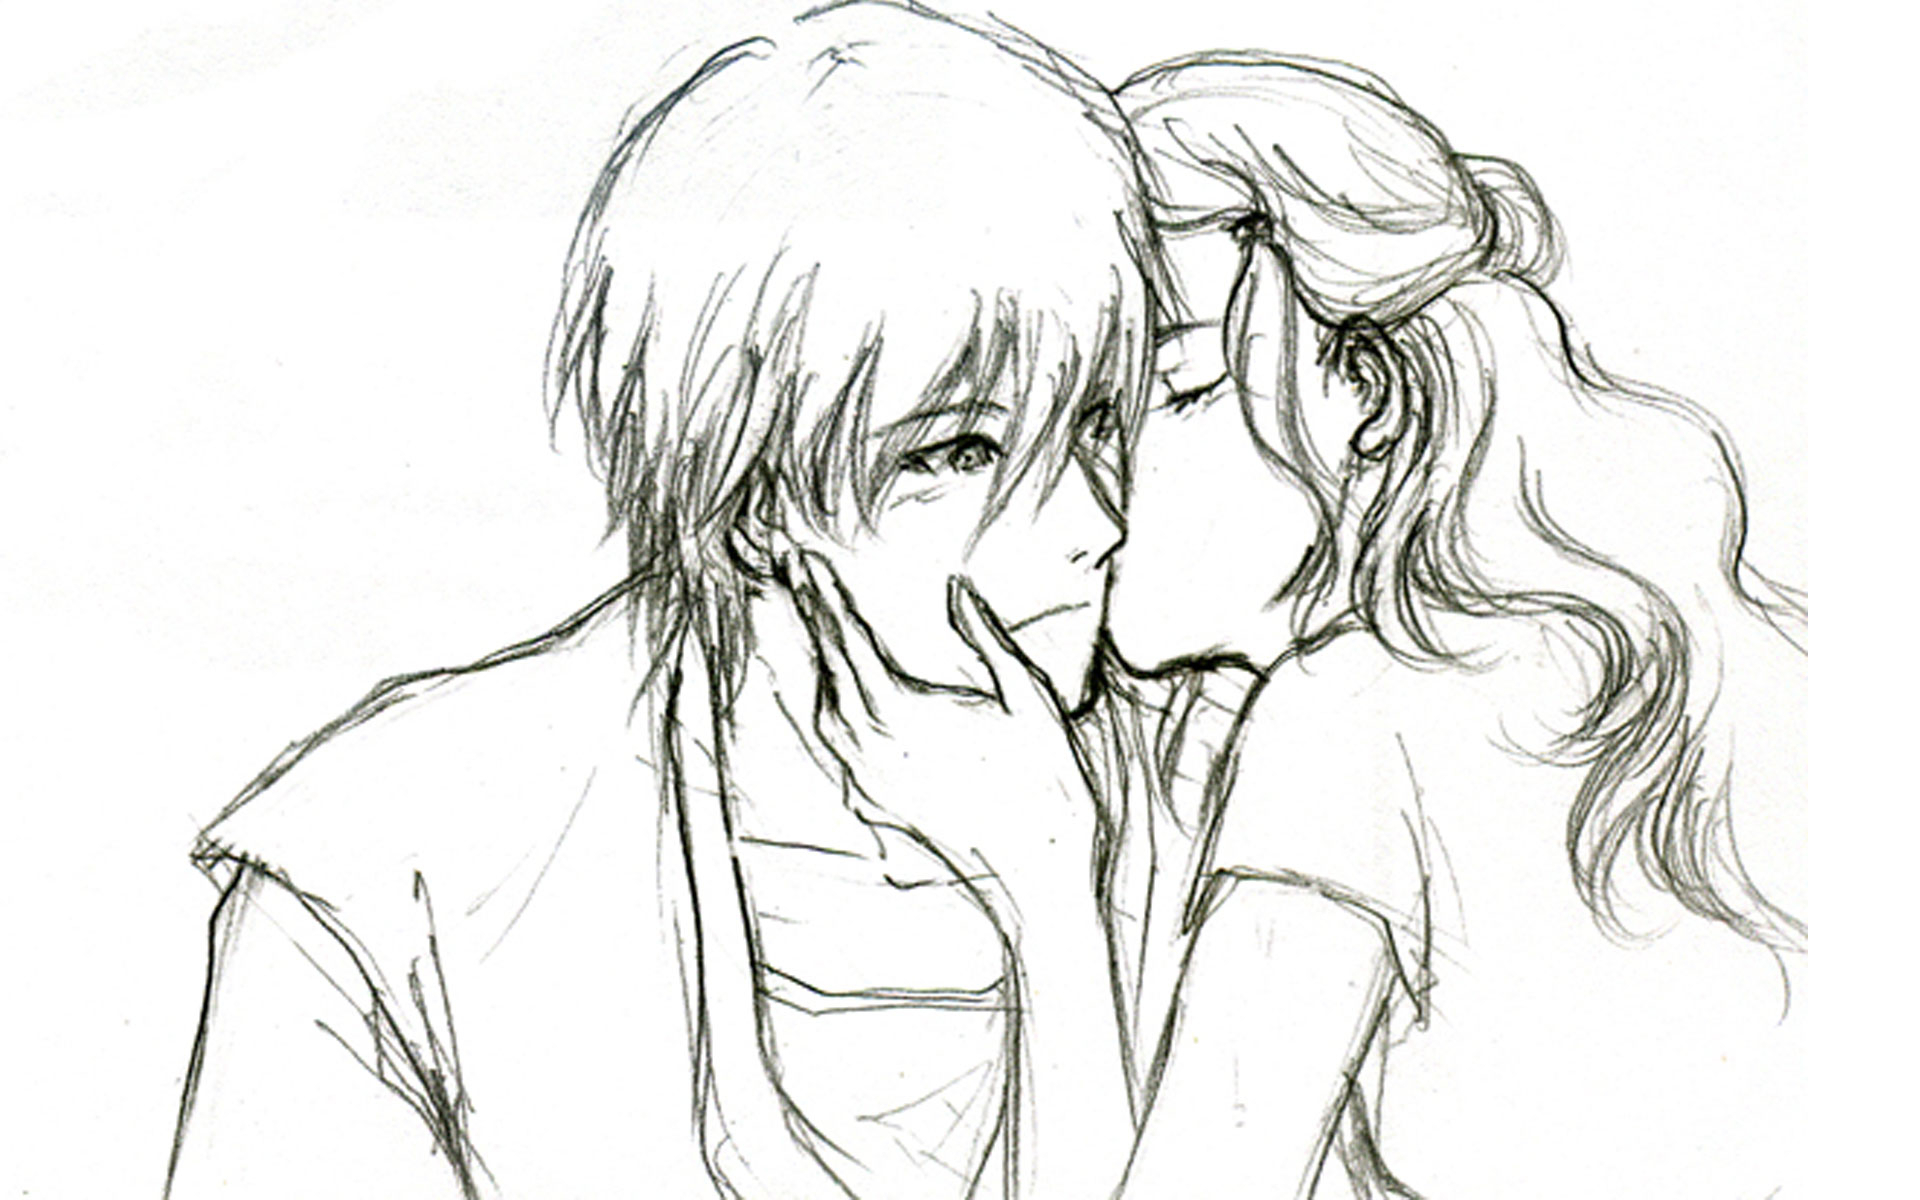 1920x1200 Love Couple Drawing Images Cute Love Drawings Pencil Art Hd